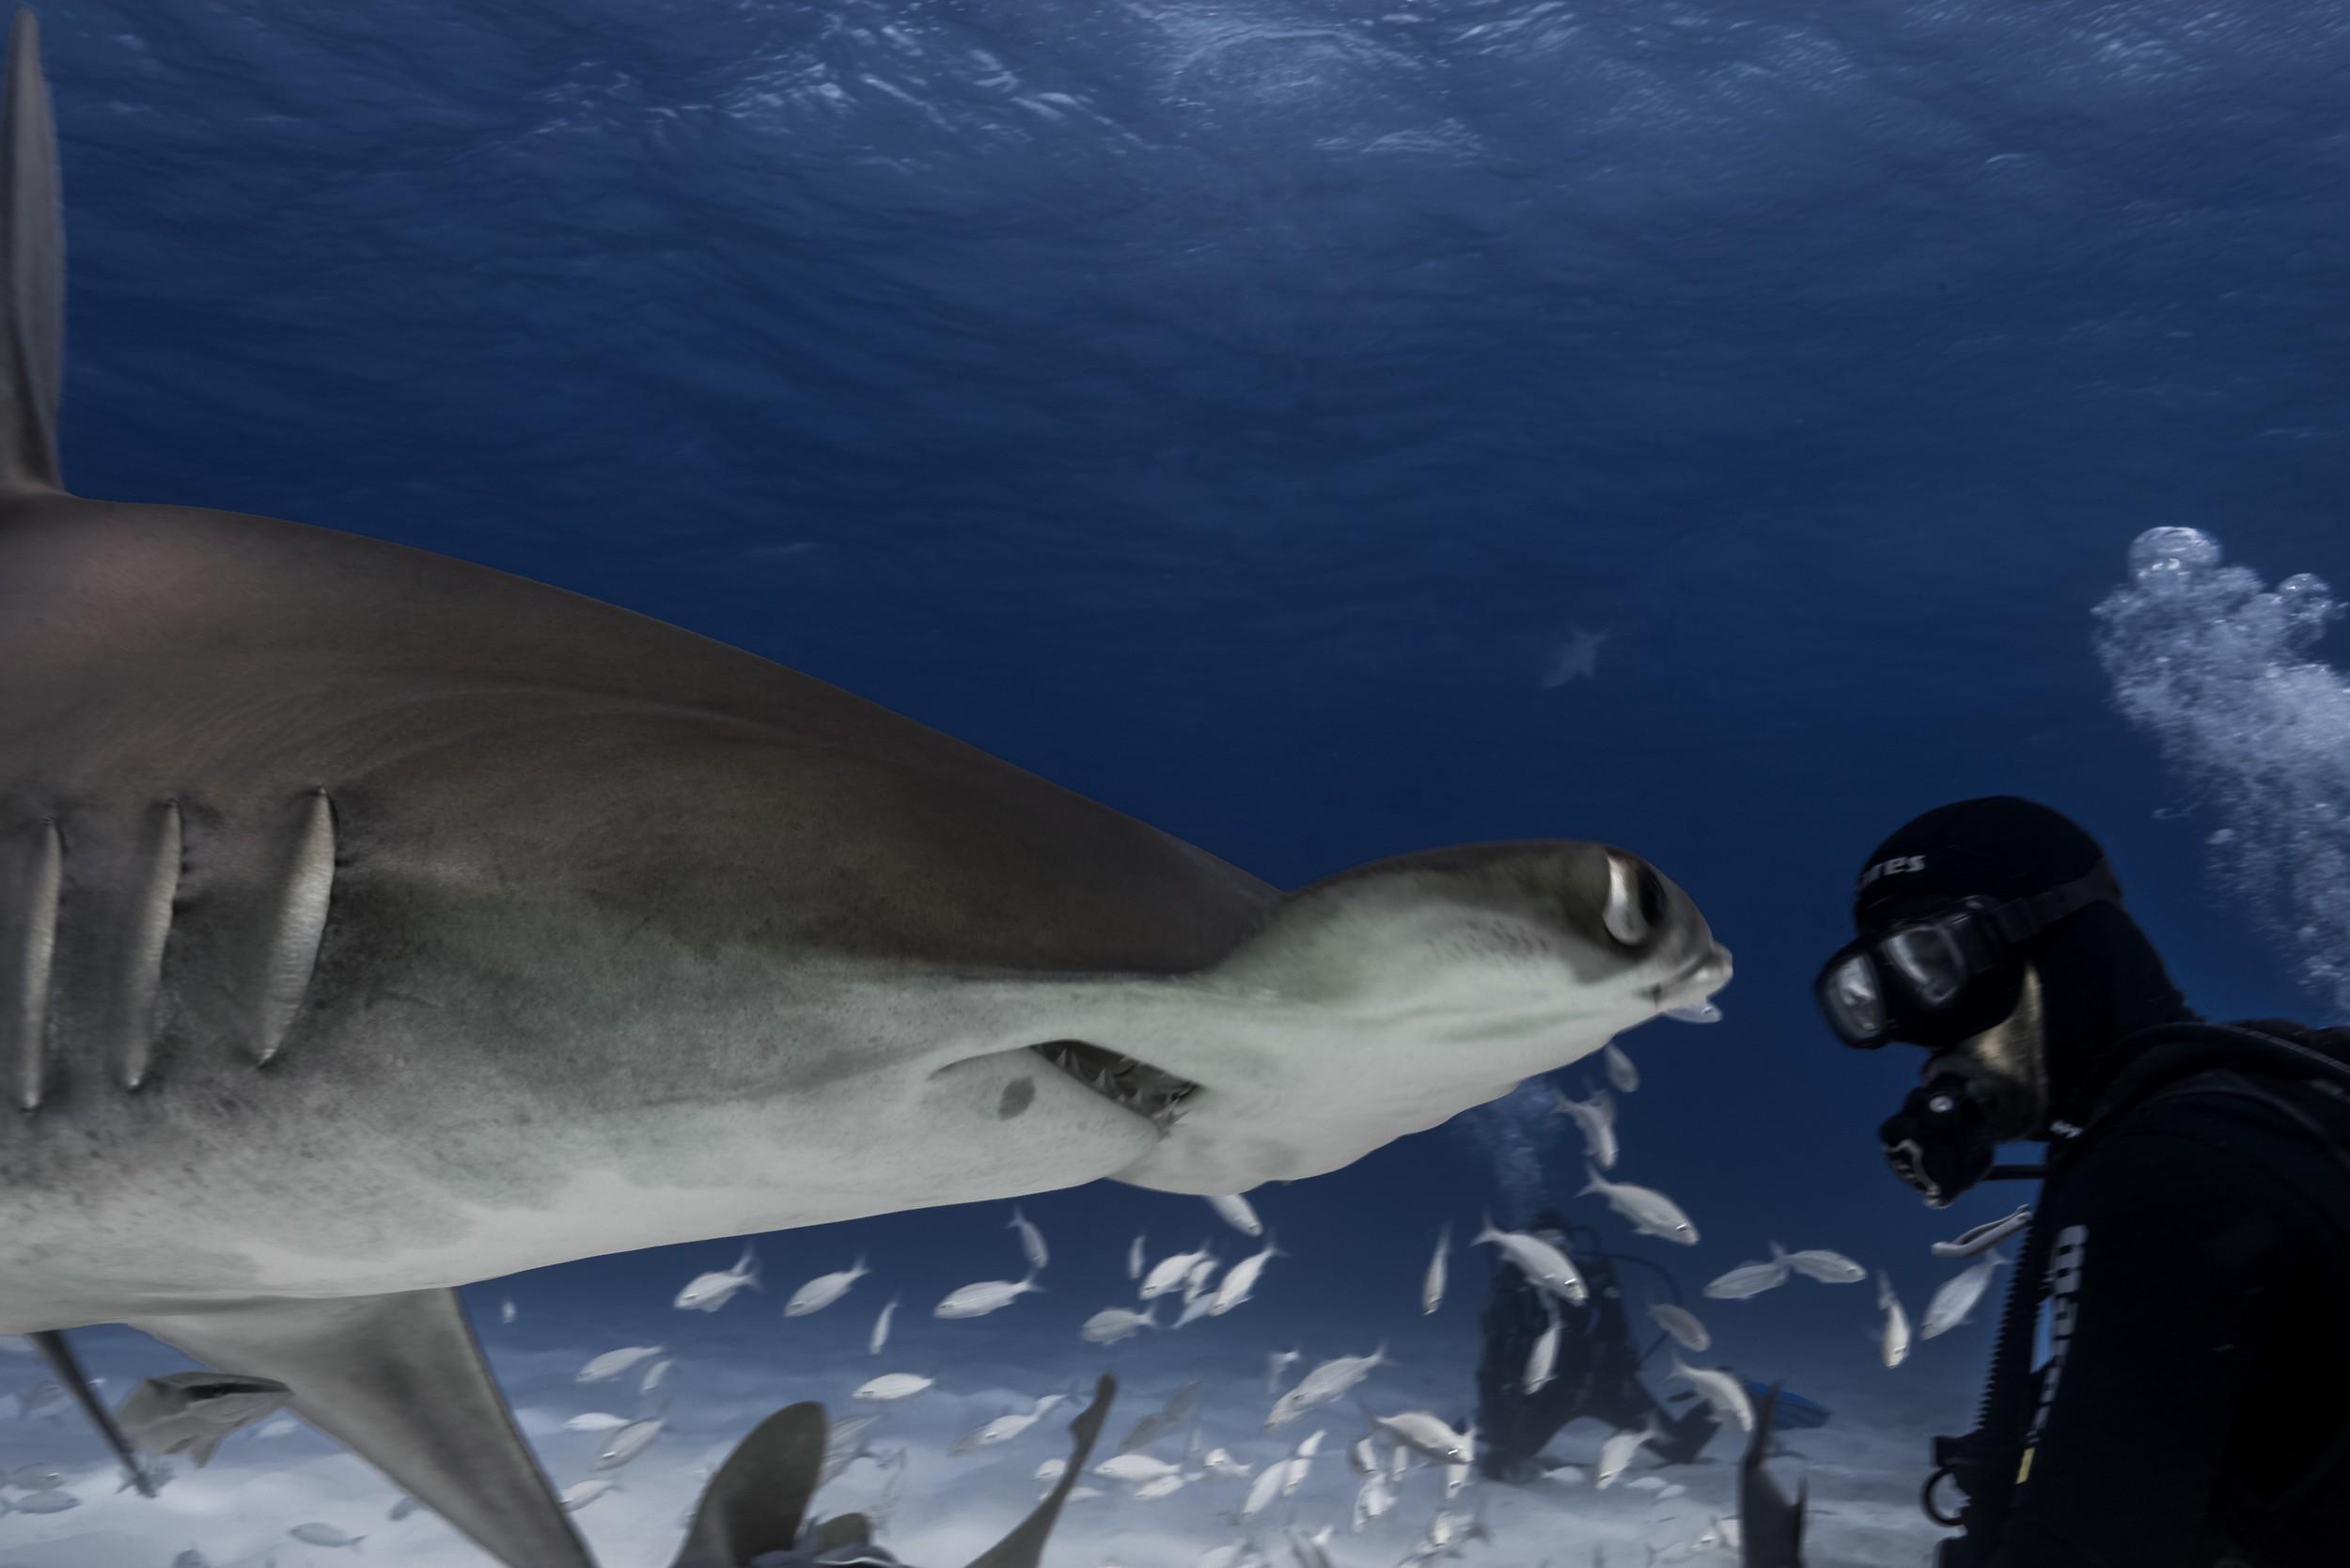 Great Hammerhead Shark (Sphyrna mokorran) - What you looking at Willis?